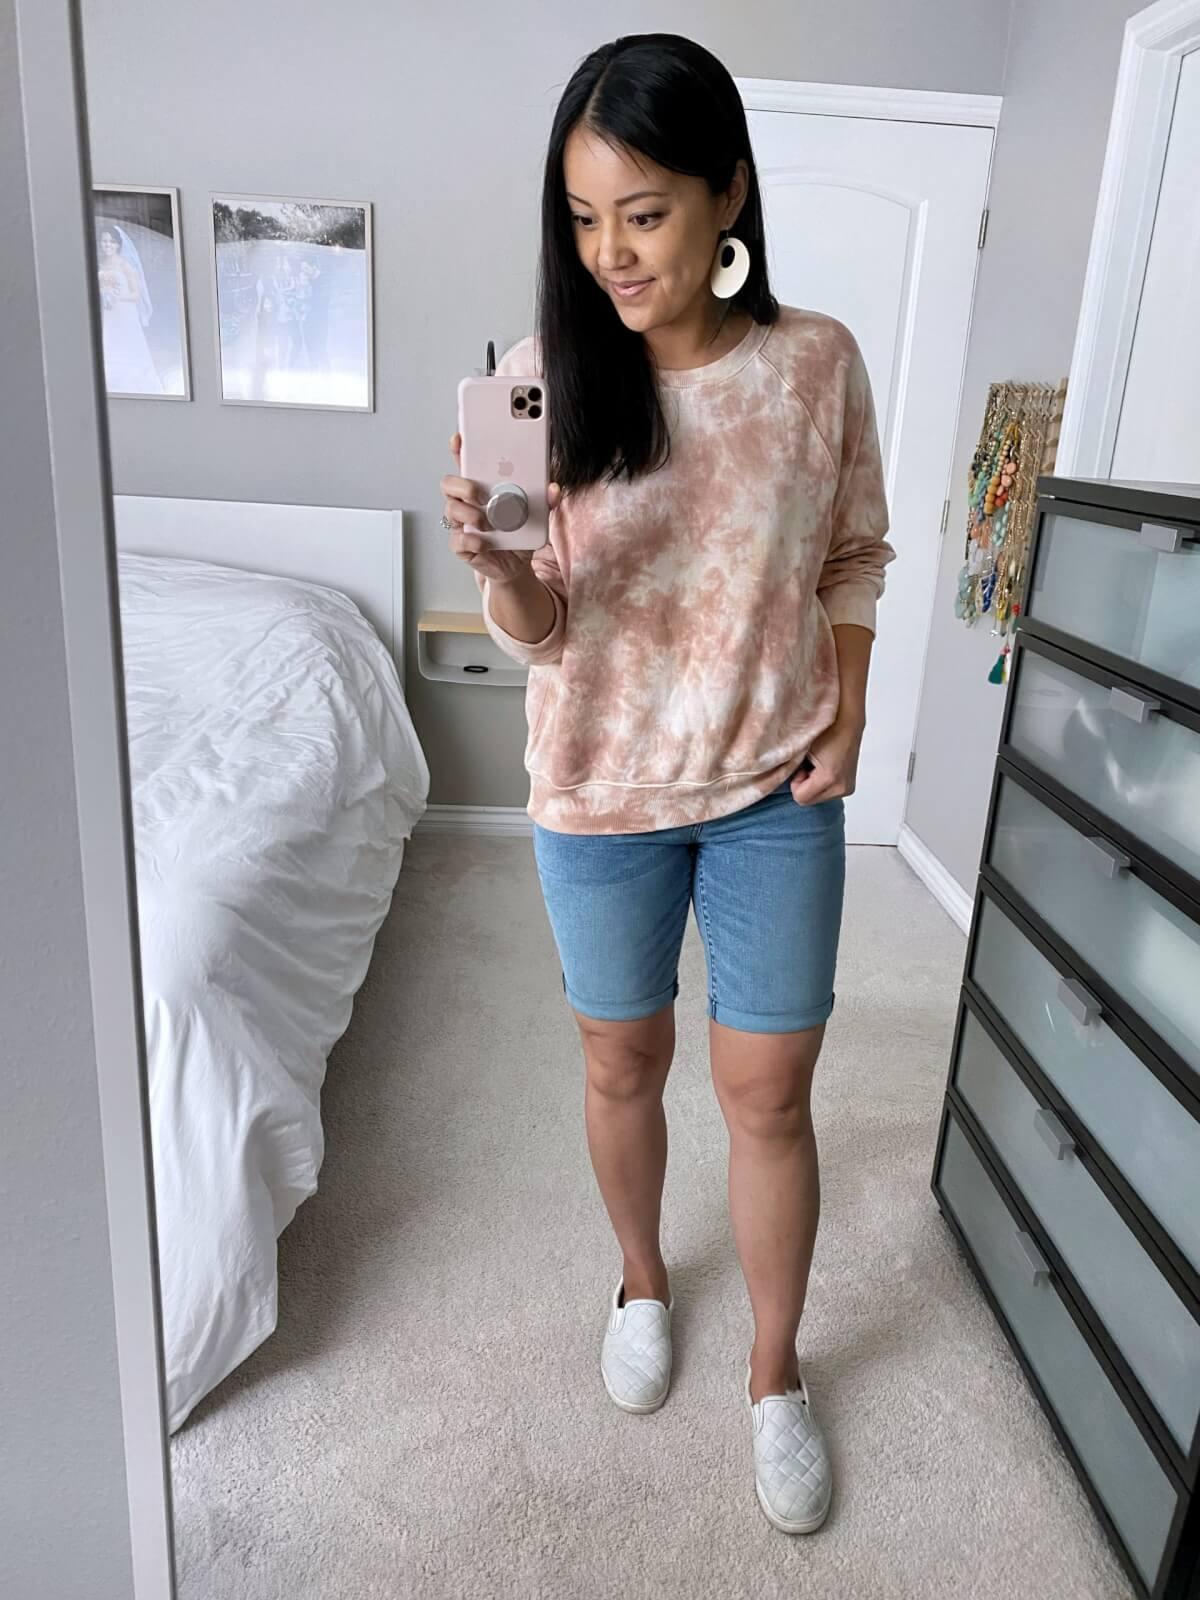 Casual Outfit: Amazon pink tie dye sweatshirt + denim bermuda shorts + white slip-on sneakers + white earrings